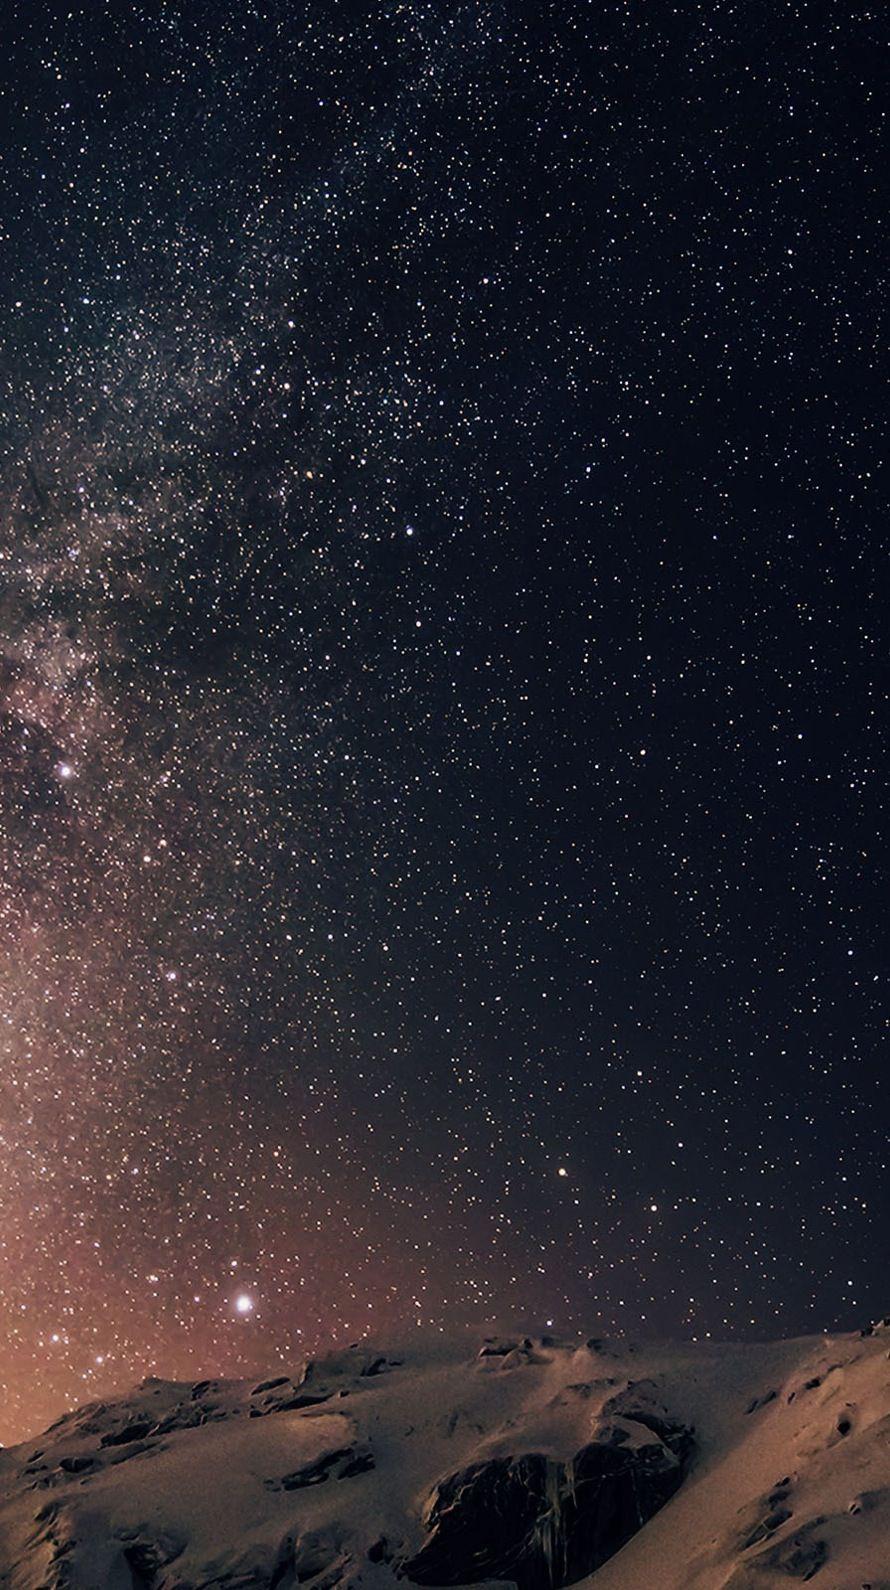 Light Gray Stars Wallpaper Hd In 2021 Iphone Wallpaper Sky Iphone 6s Wallpaper Galaxy Wallpaper